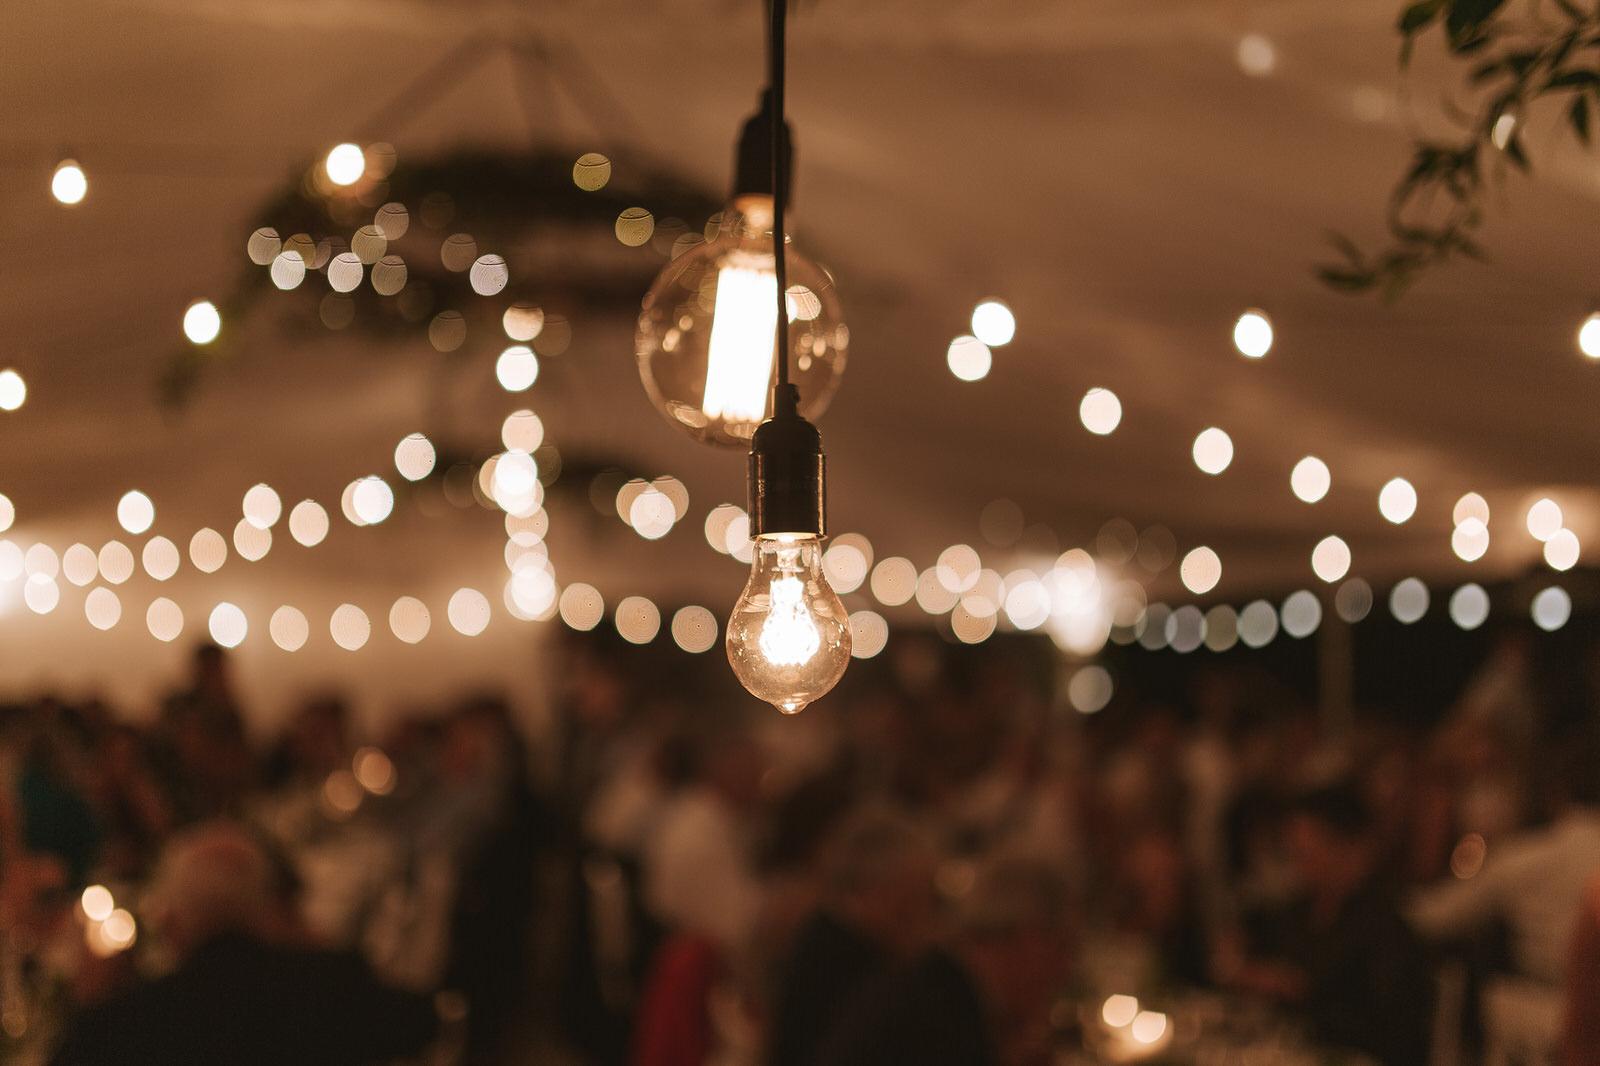 newfound-r-s-ataahua-garden-venue-tauranga-wedding-124